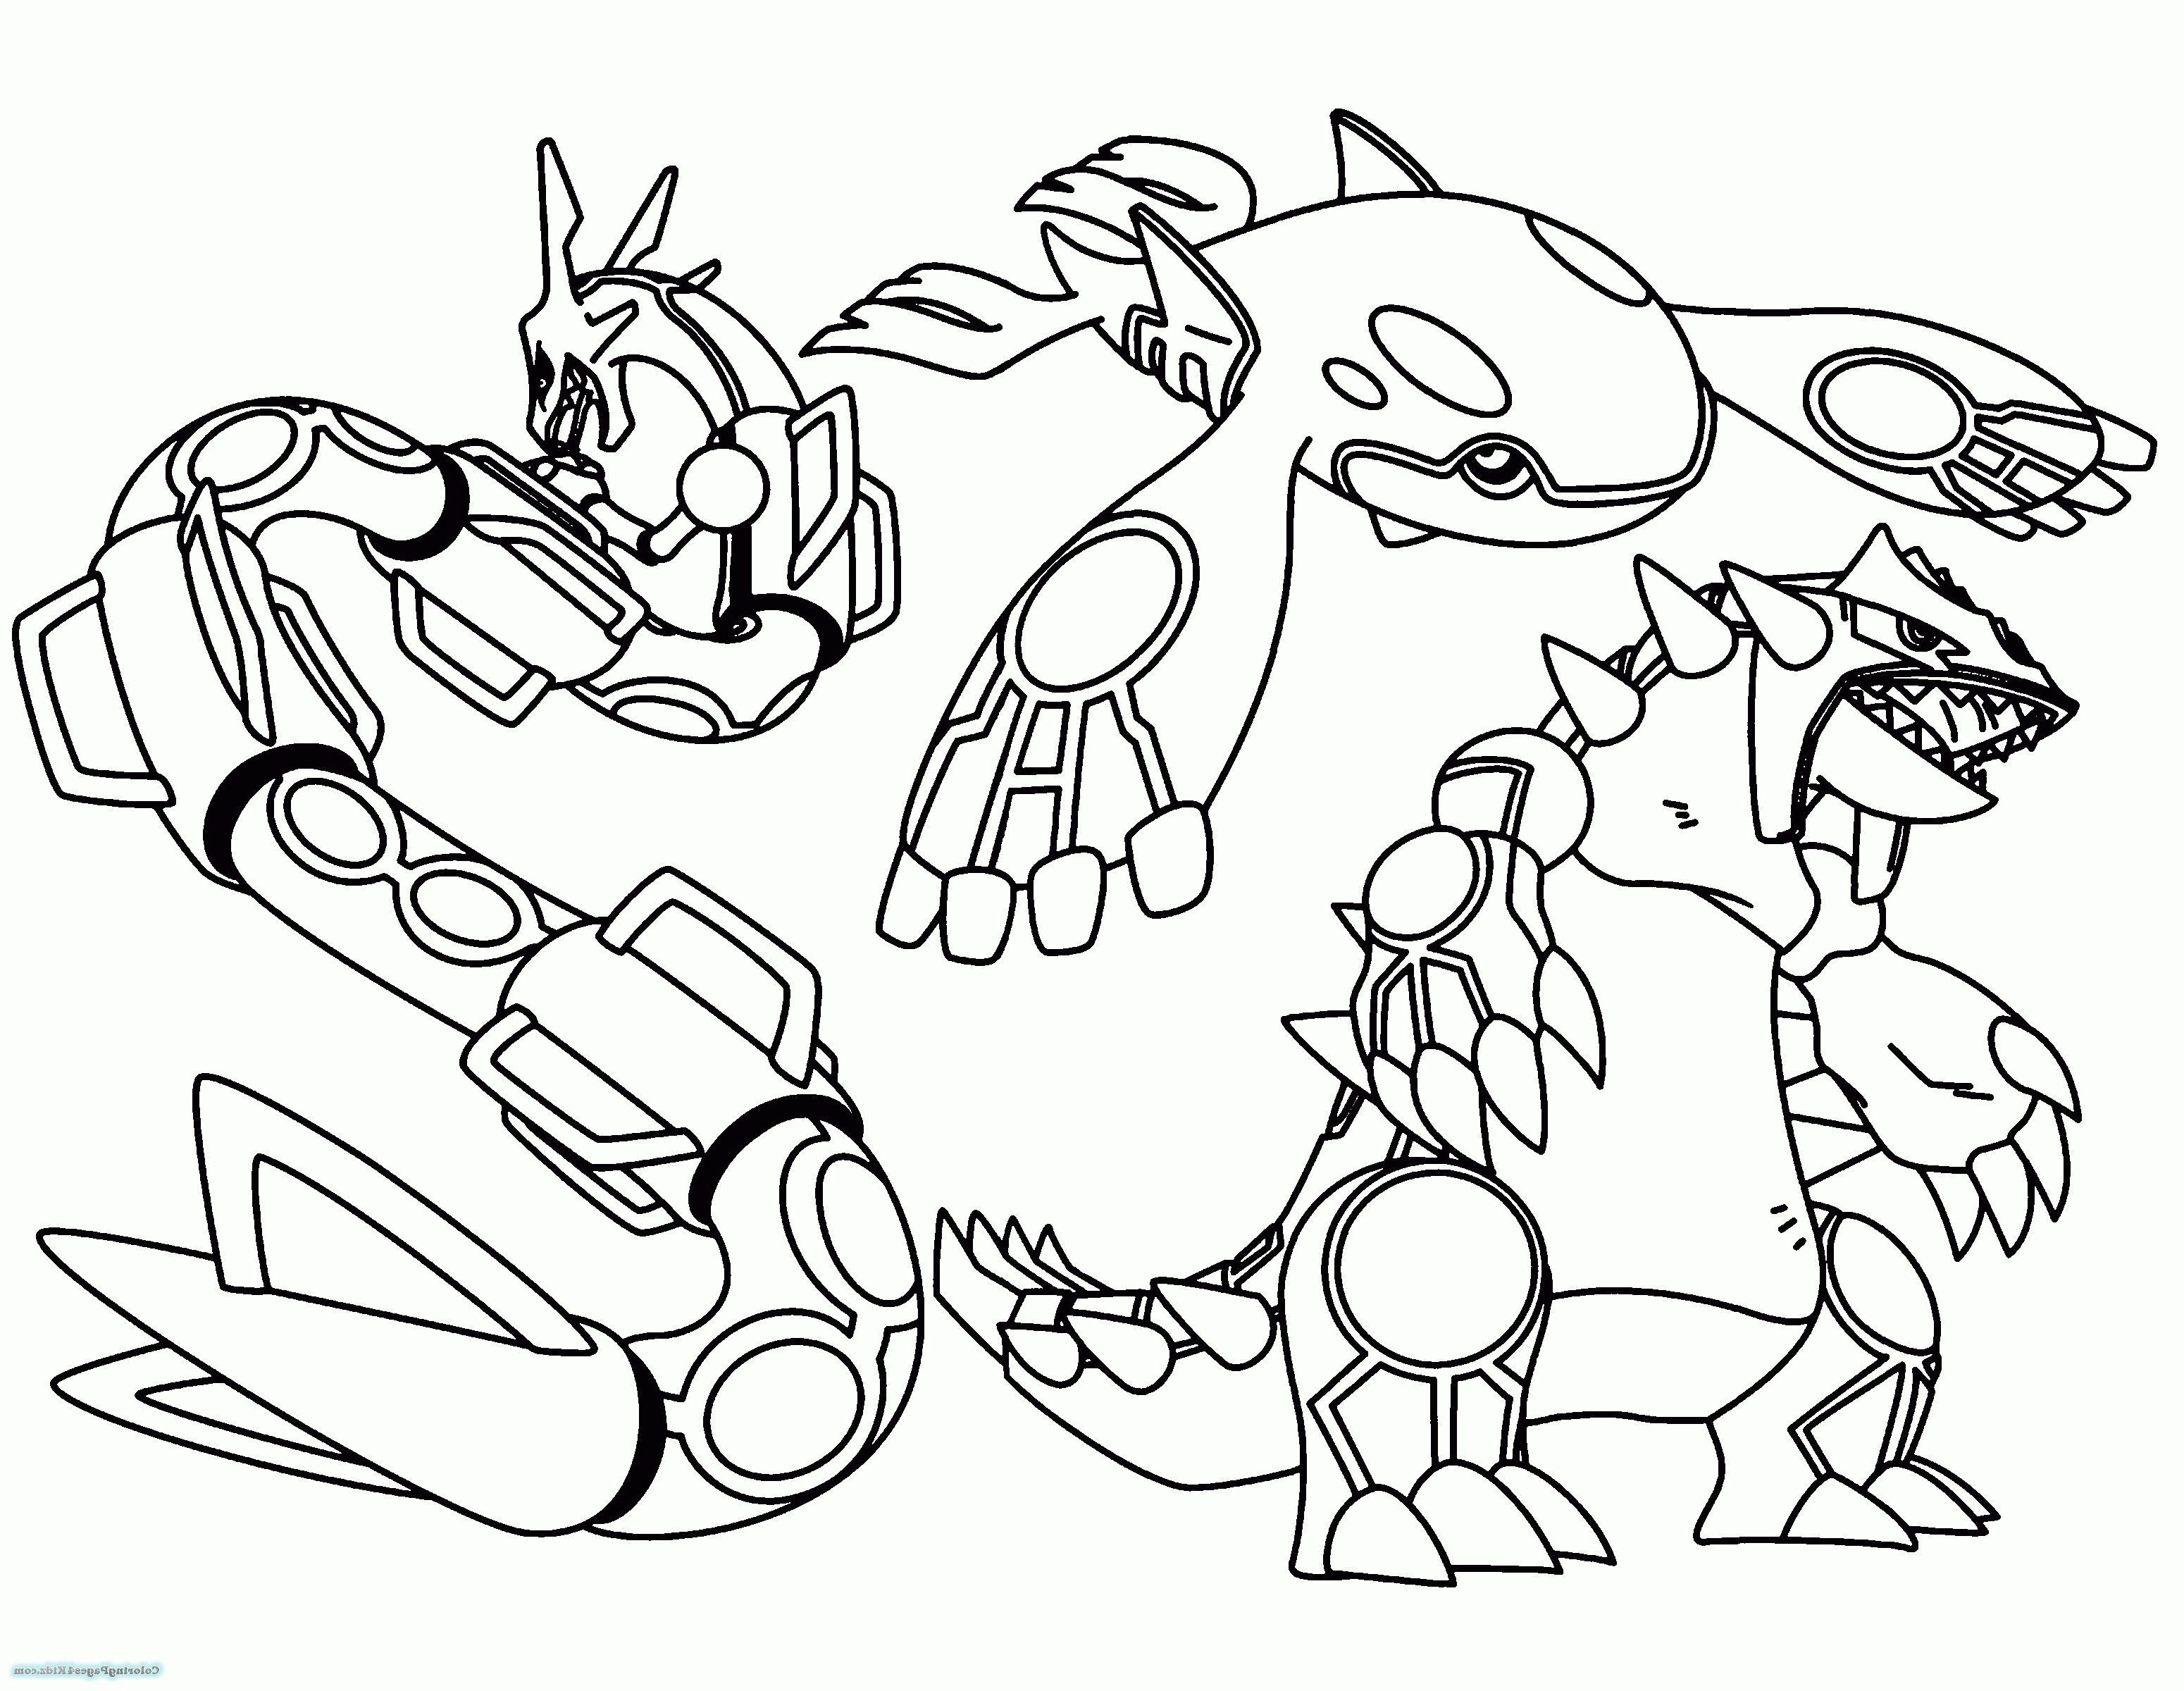 Pokemon Coloring Game 9ncm Pokemon Coloringe Free Printableses Legendary Mega Charizard Eevee Pokemon Coloring Spring Coloring Pages Coloring Pages